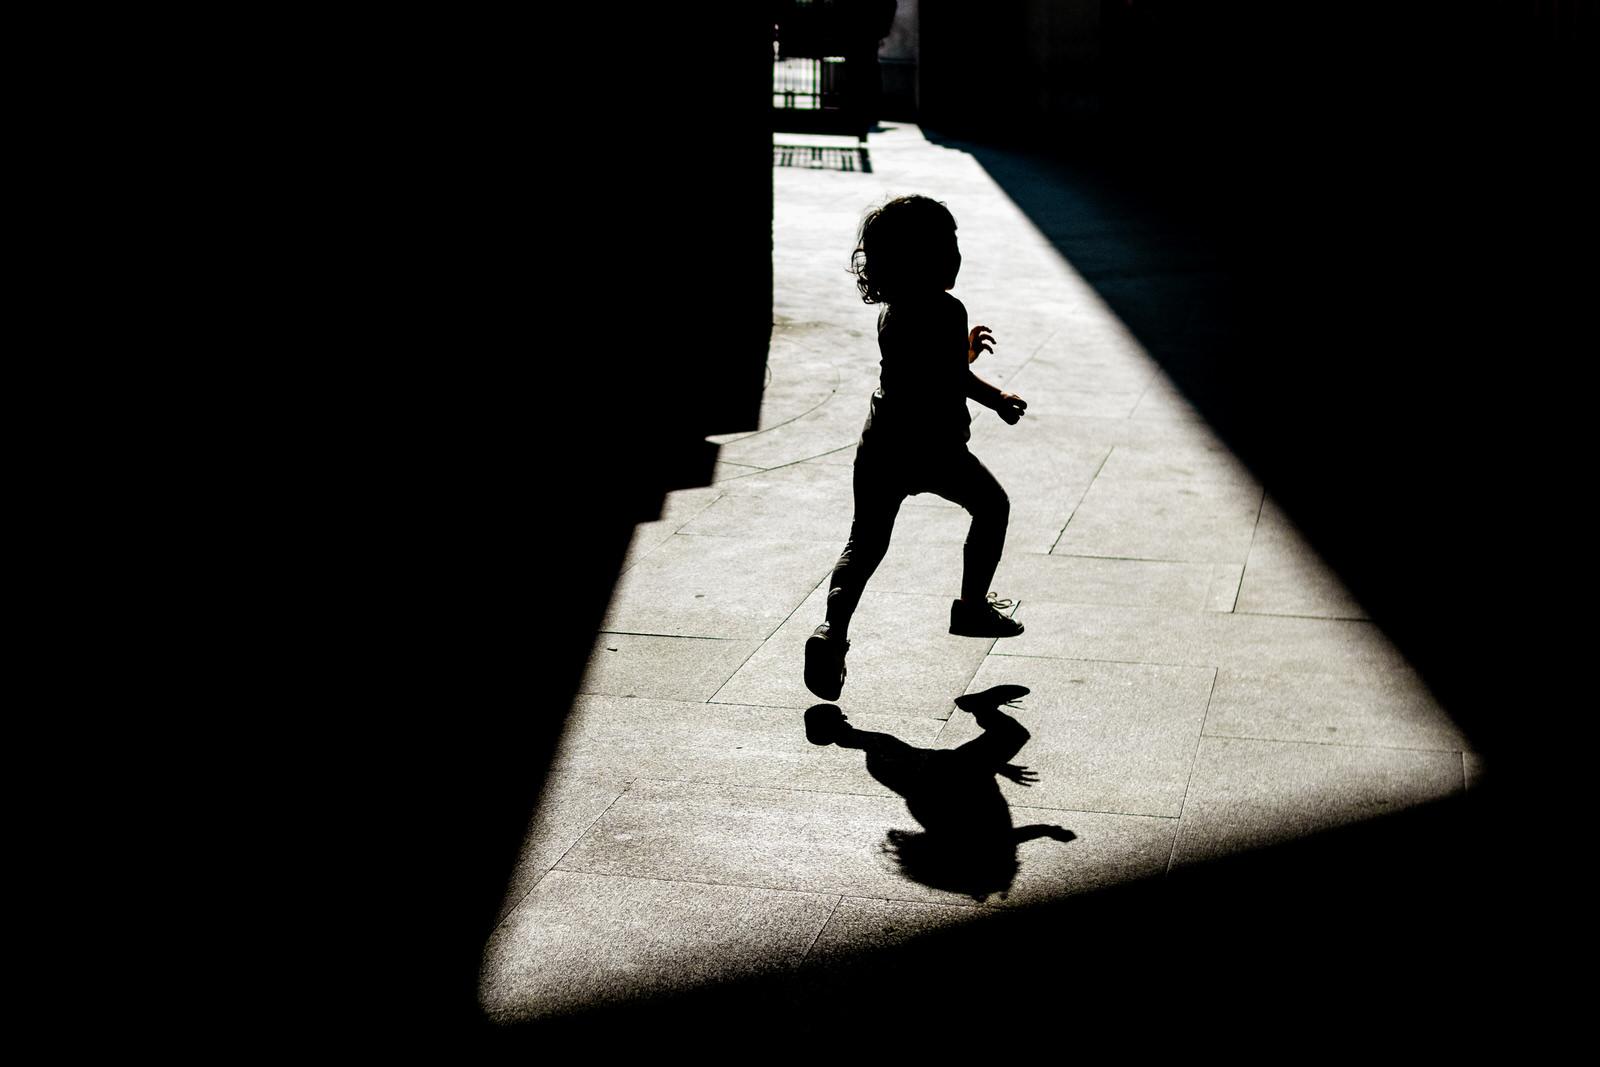 Craig Reilly | Street Photography International Milan